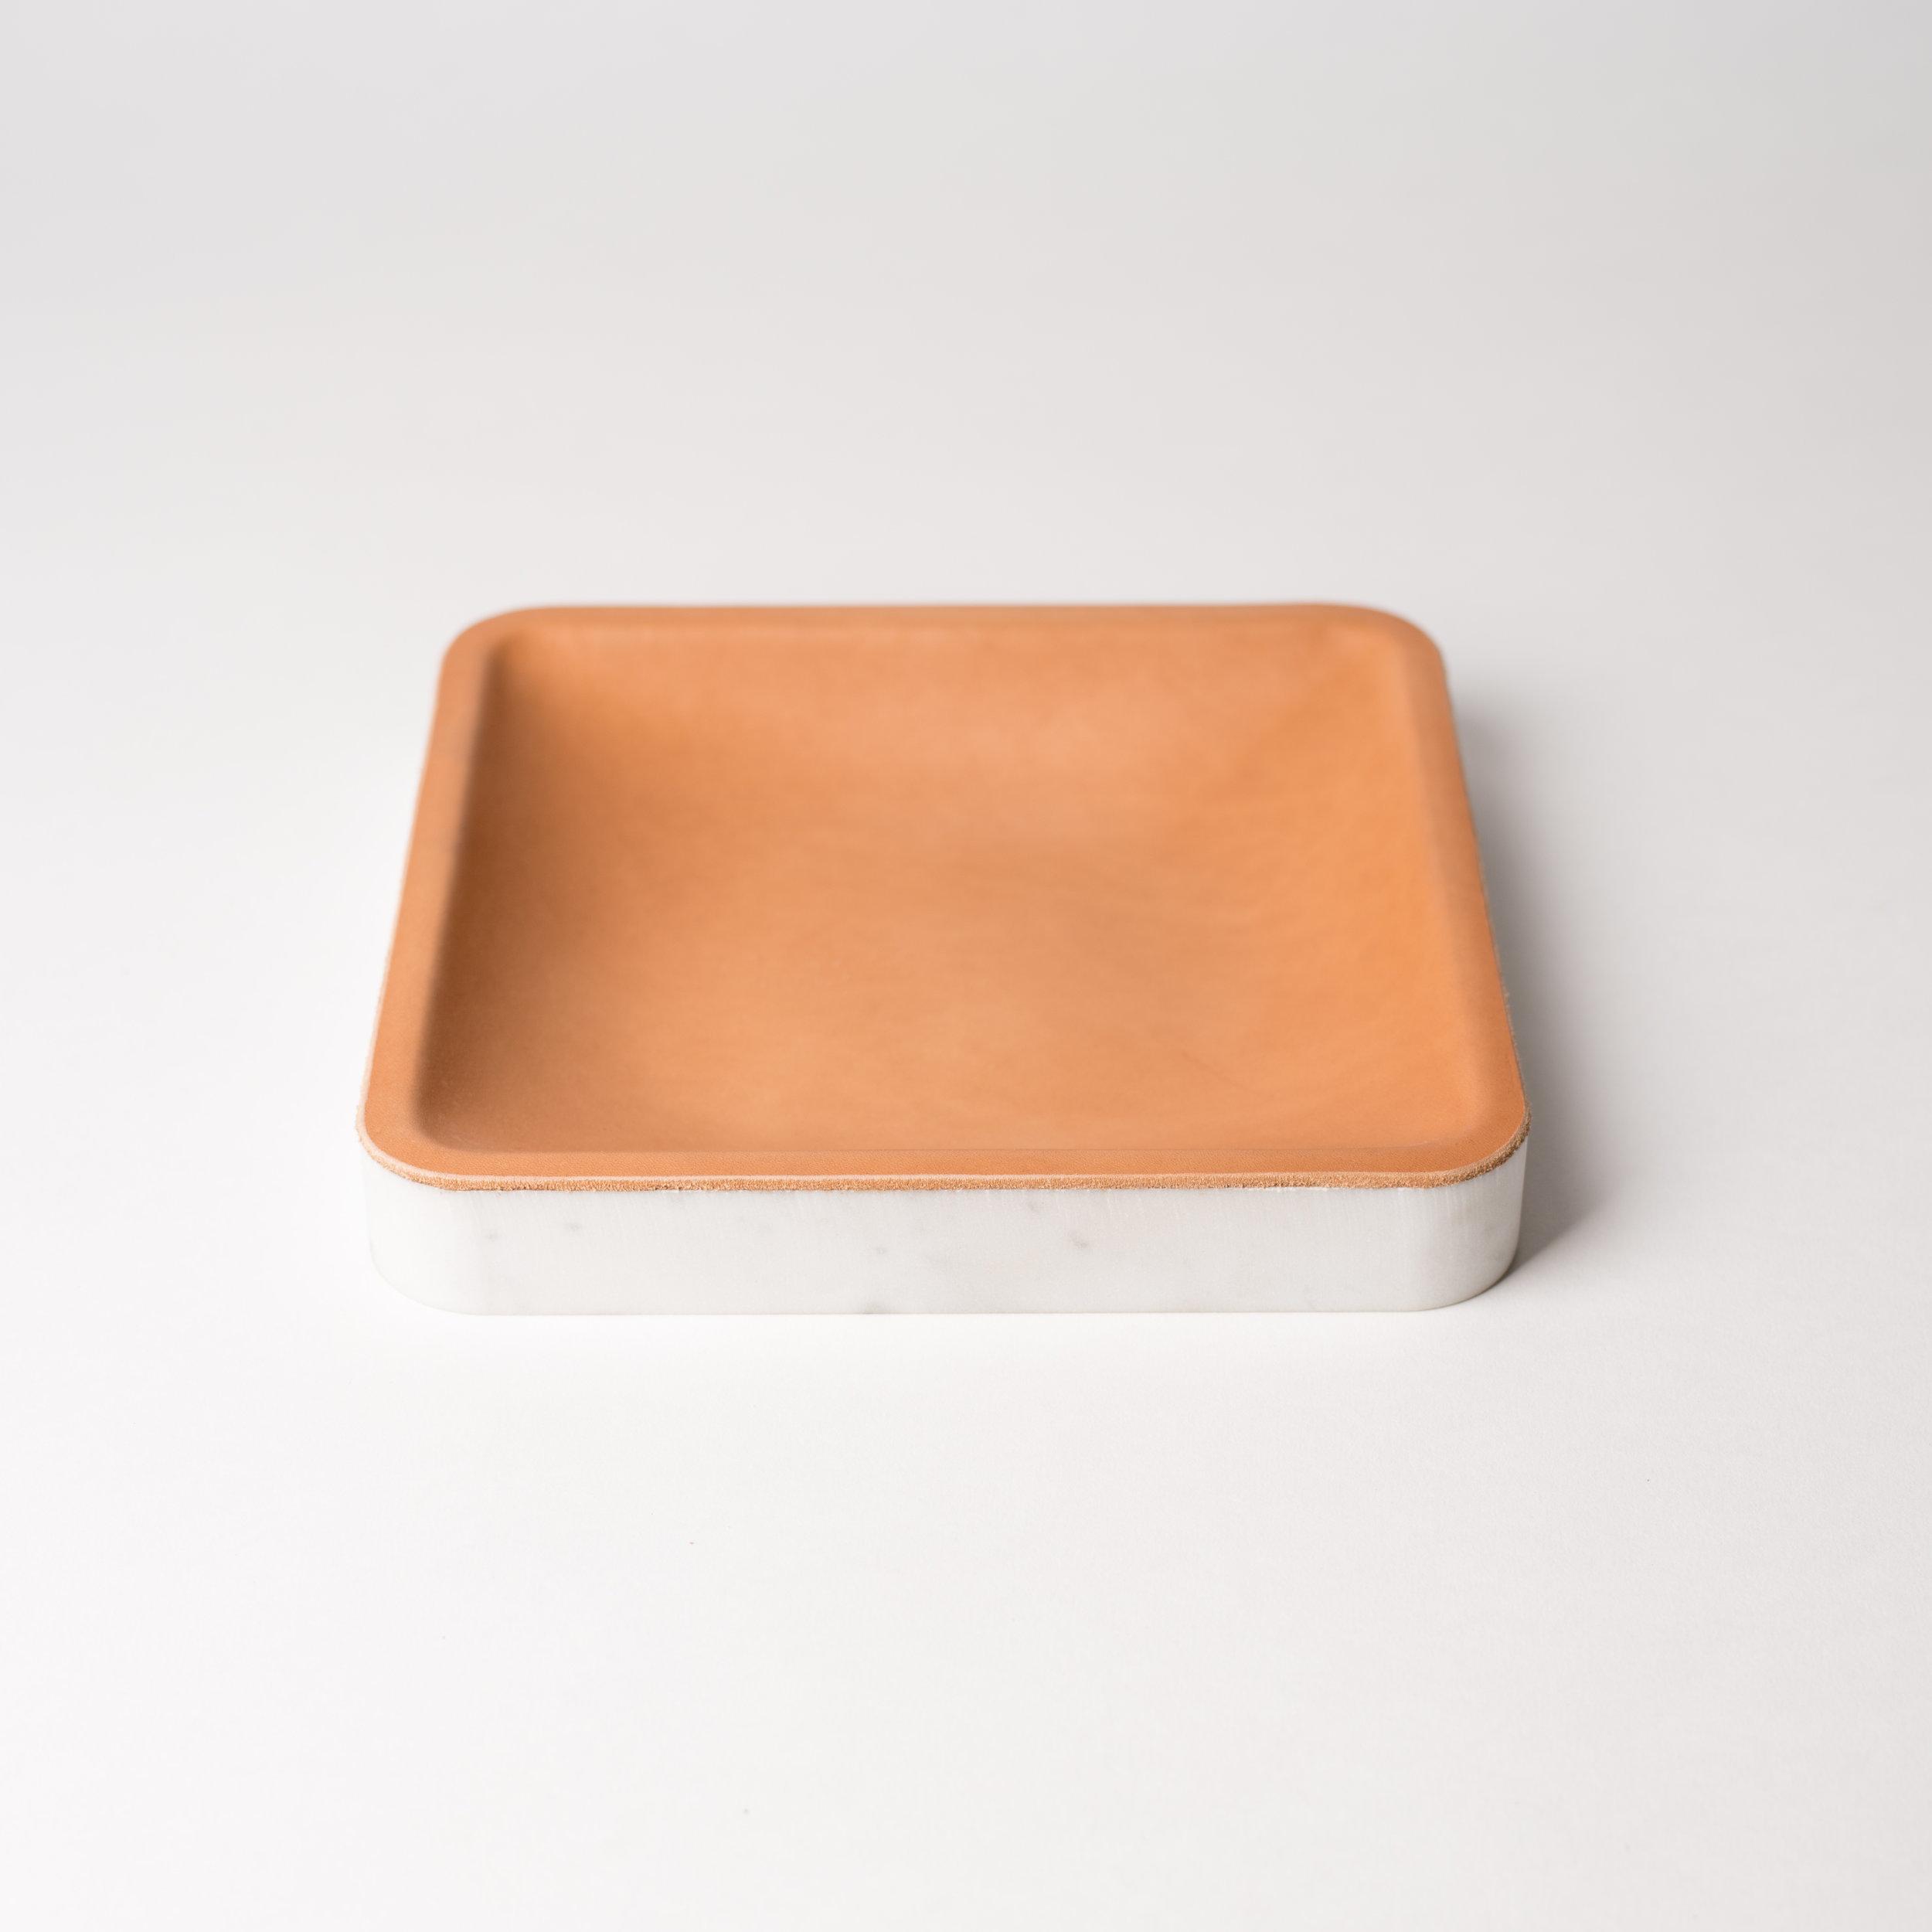 new trays oct 5th-1291.jpg